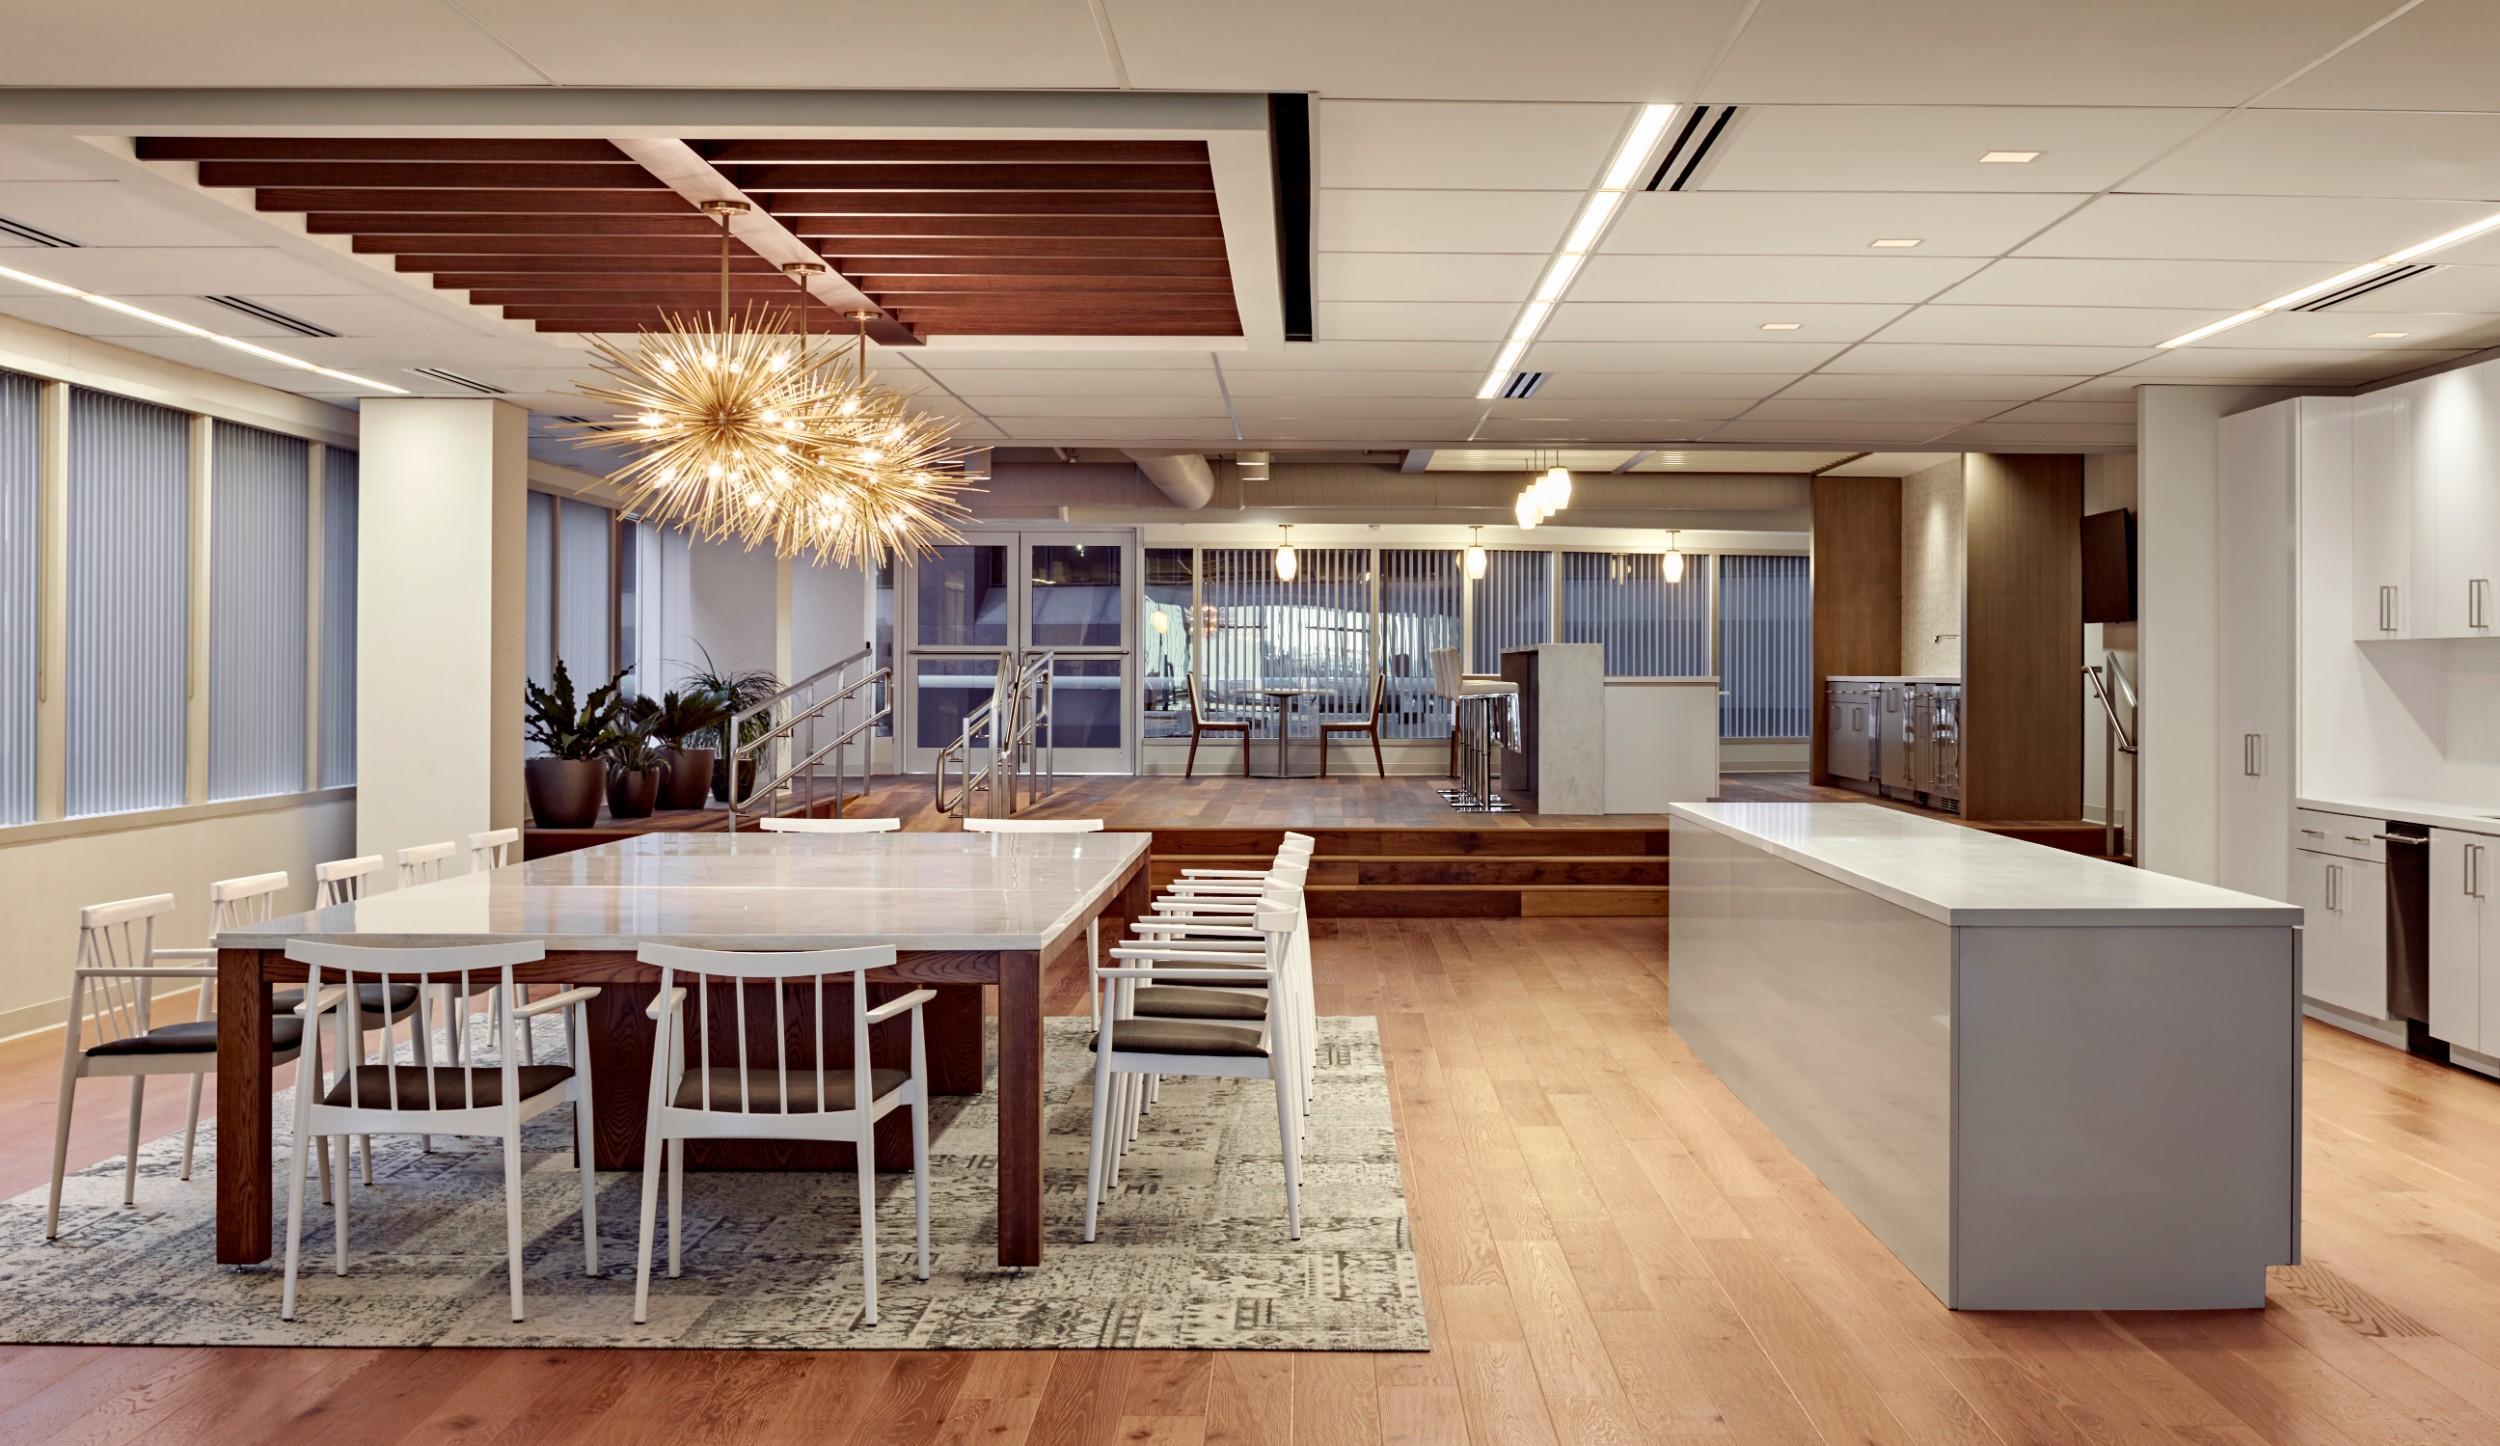 Corderman_Construction_CBRE_Amenity_Center_100_High_Kitchen_Cafe.jpg